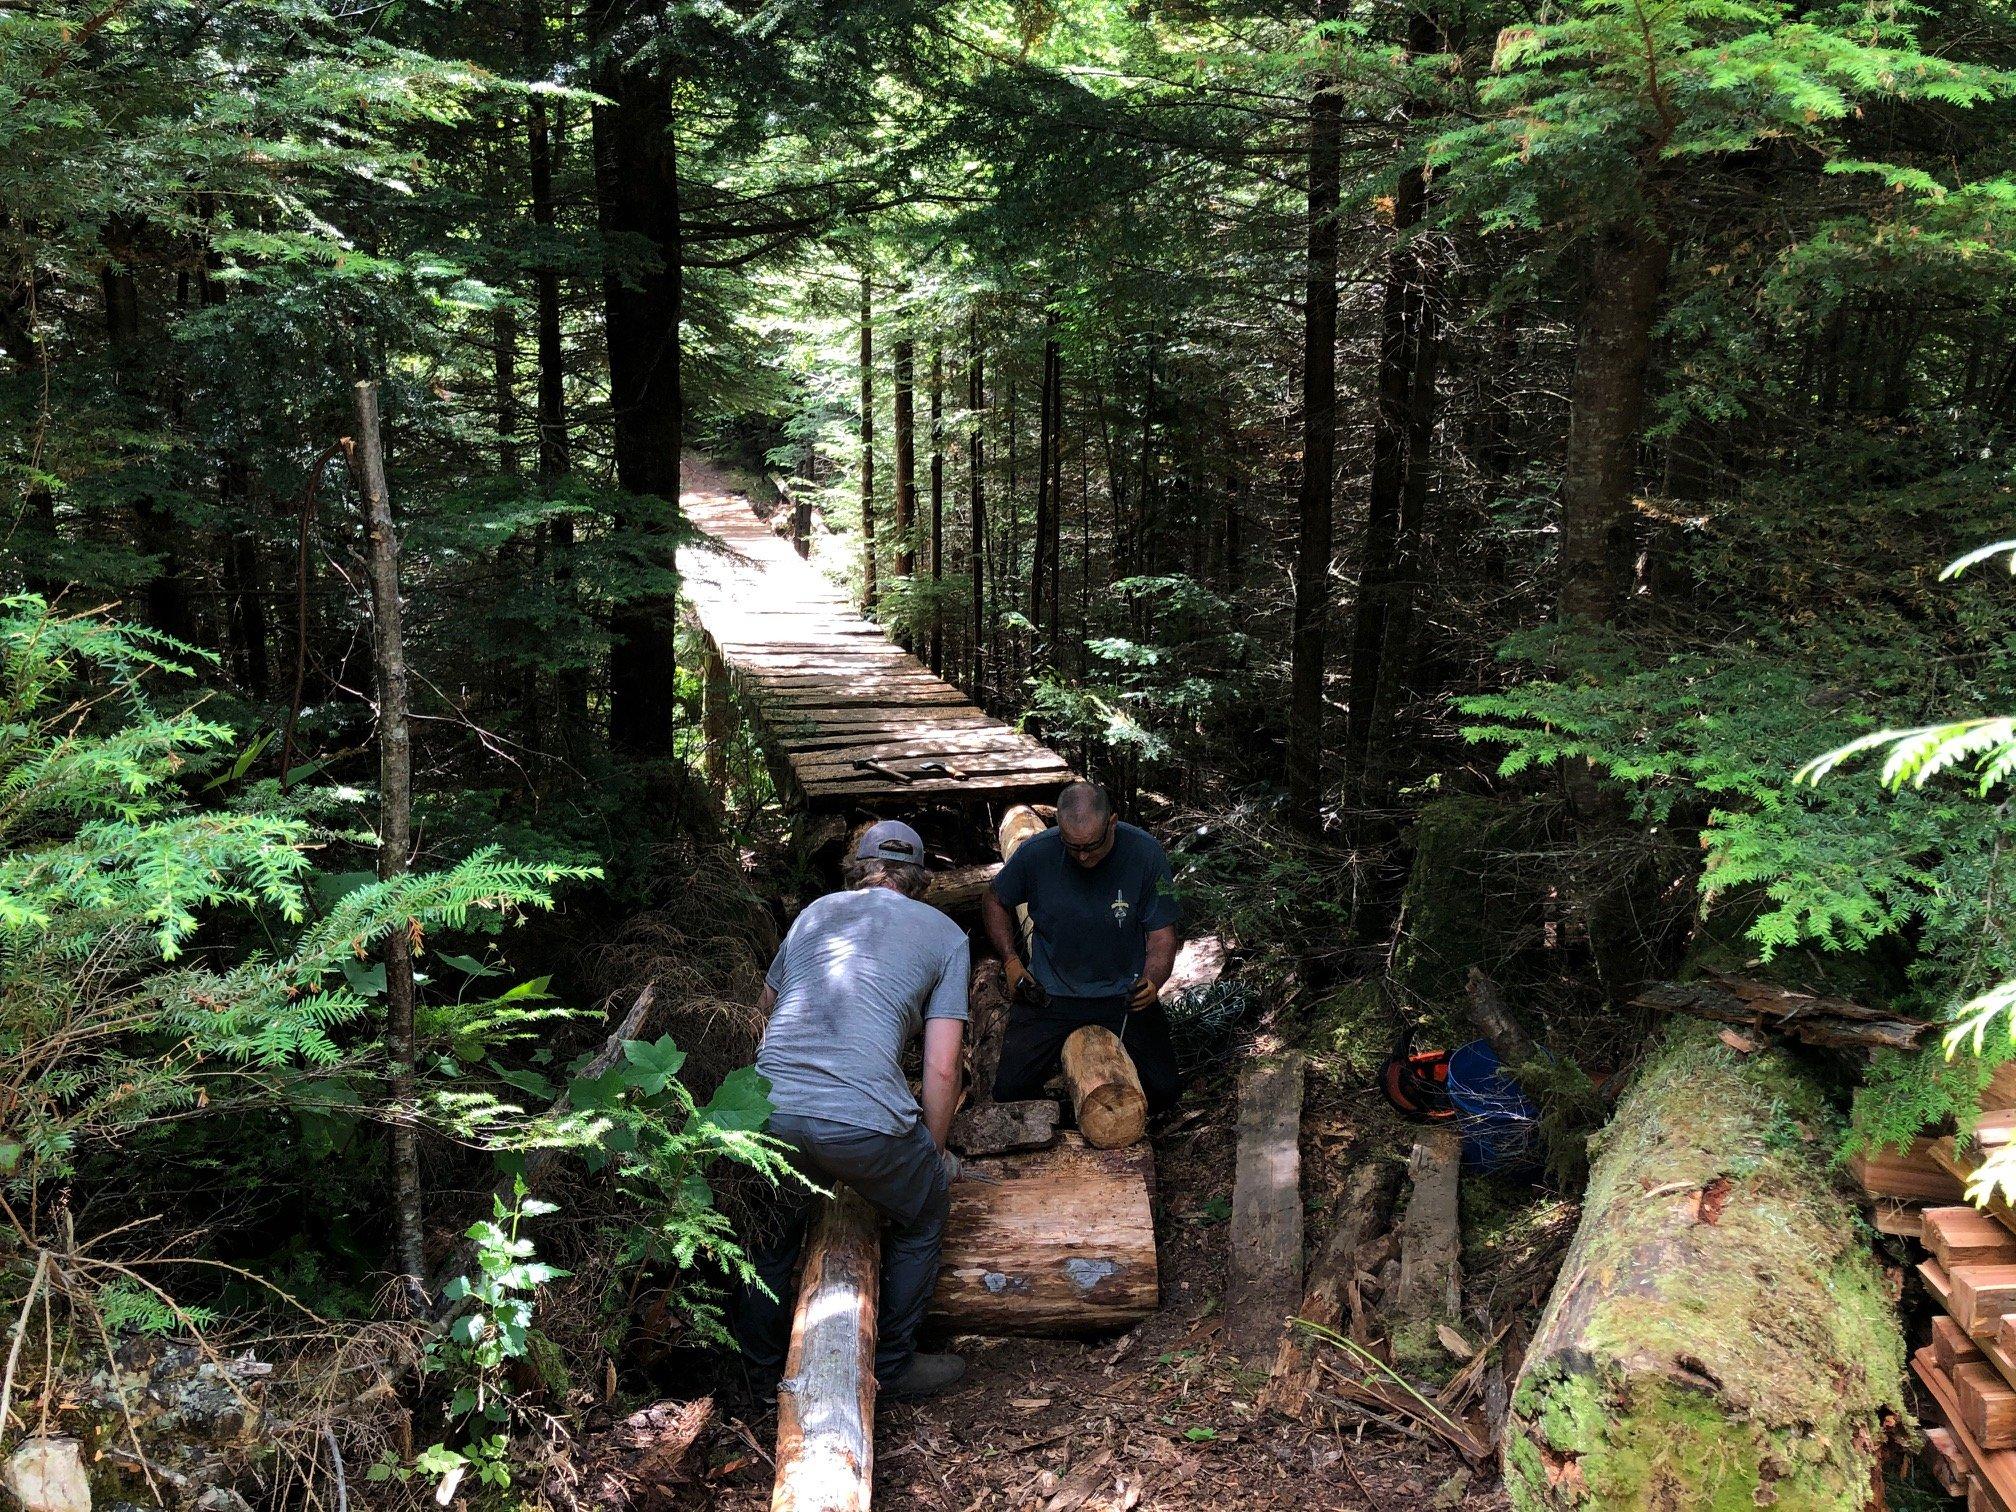 Two trail workers repairing a wood bridge